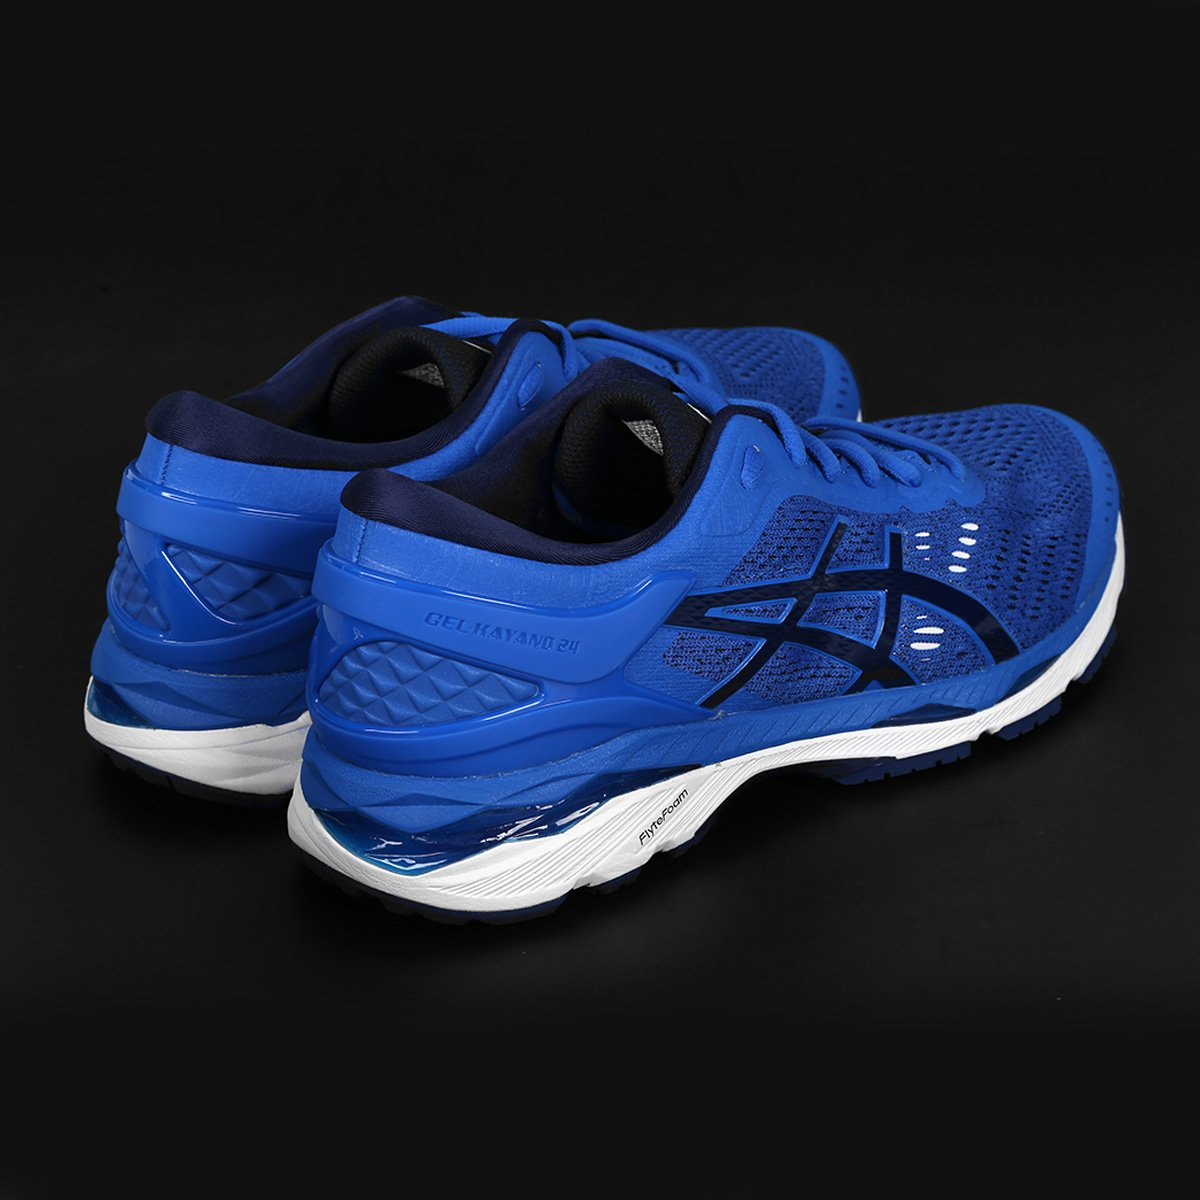 Tênis Asics Gel-Kayano 24 Masculino - Azul e Preto - Compre Agora ... 3985461970d55